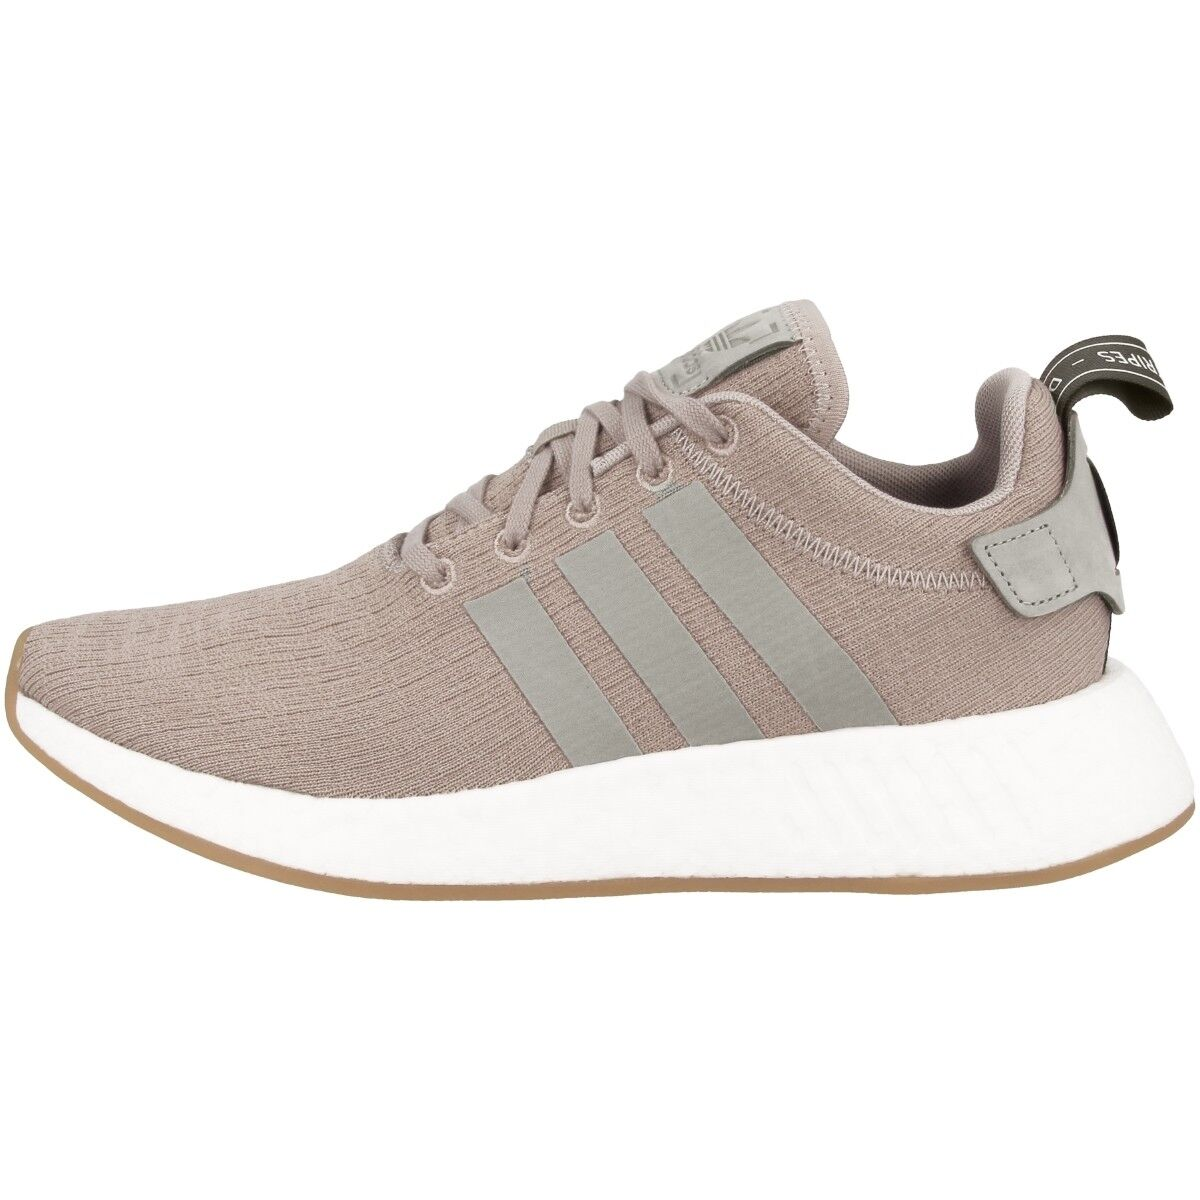 Adidas NMD_R2 Schuhe grey Freizeit Sneaker Turnschuhe Sneakers vapour grey Schuhe CQ2399 f3cc64